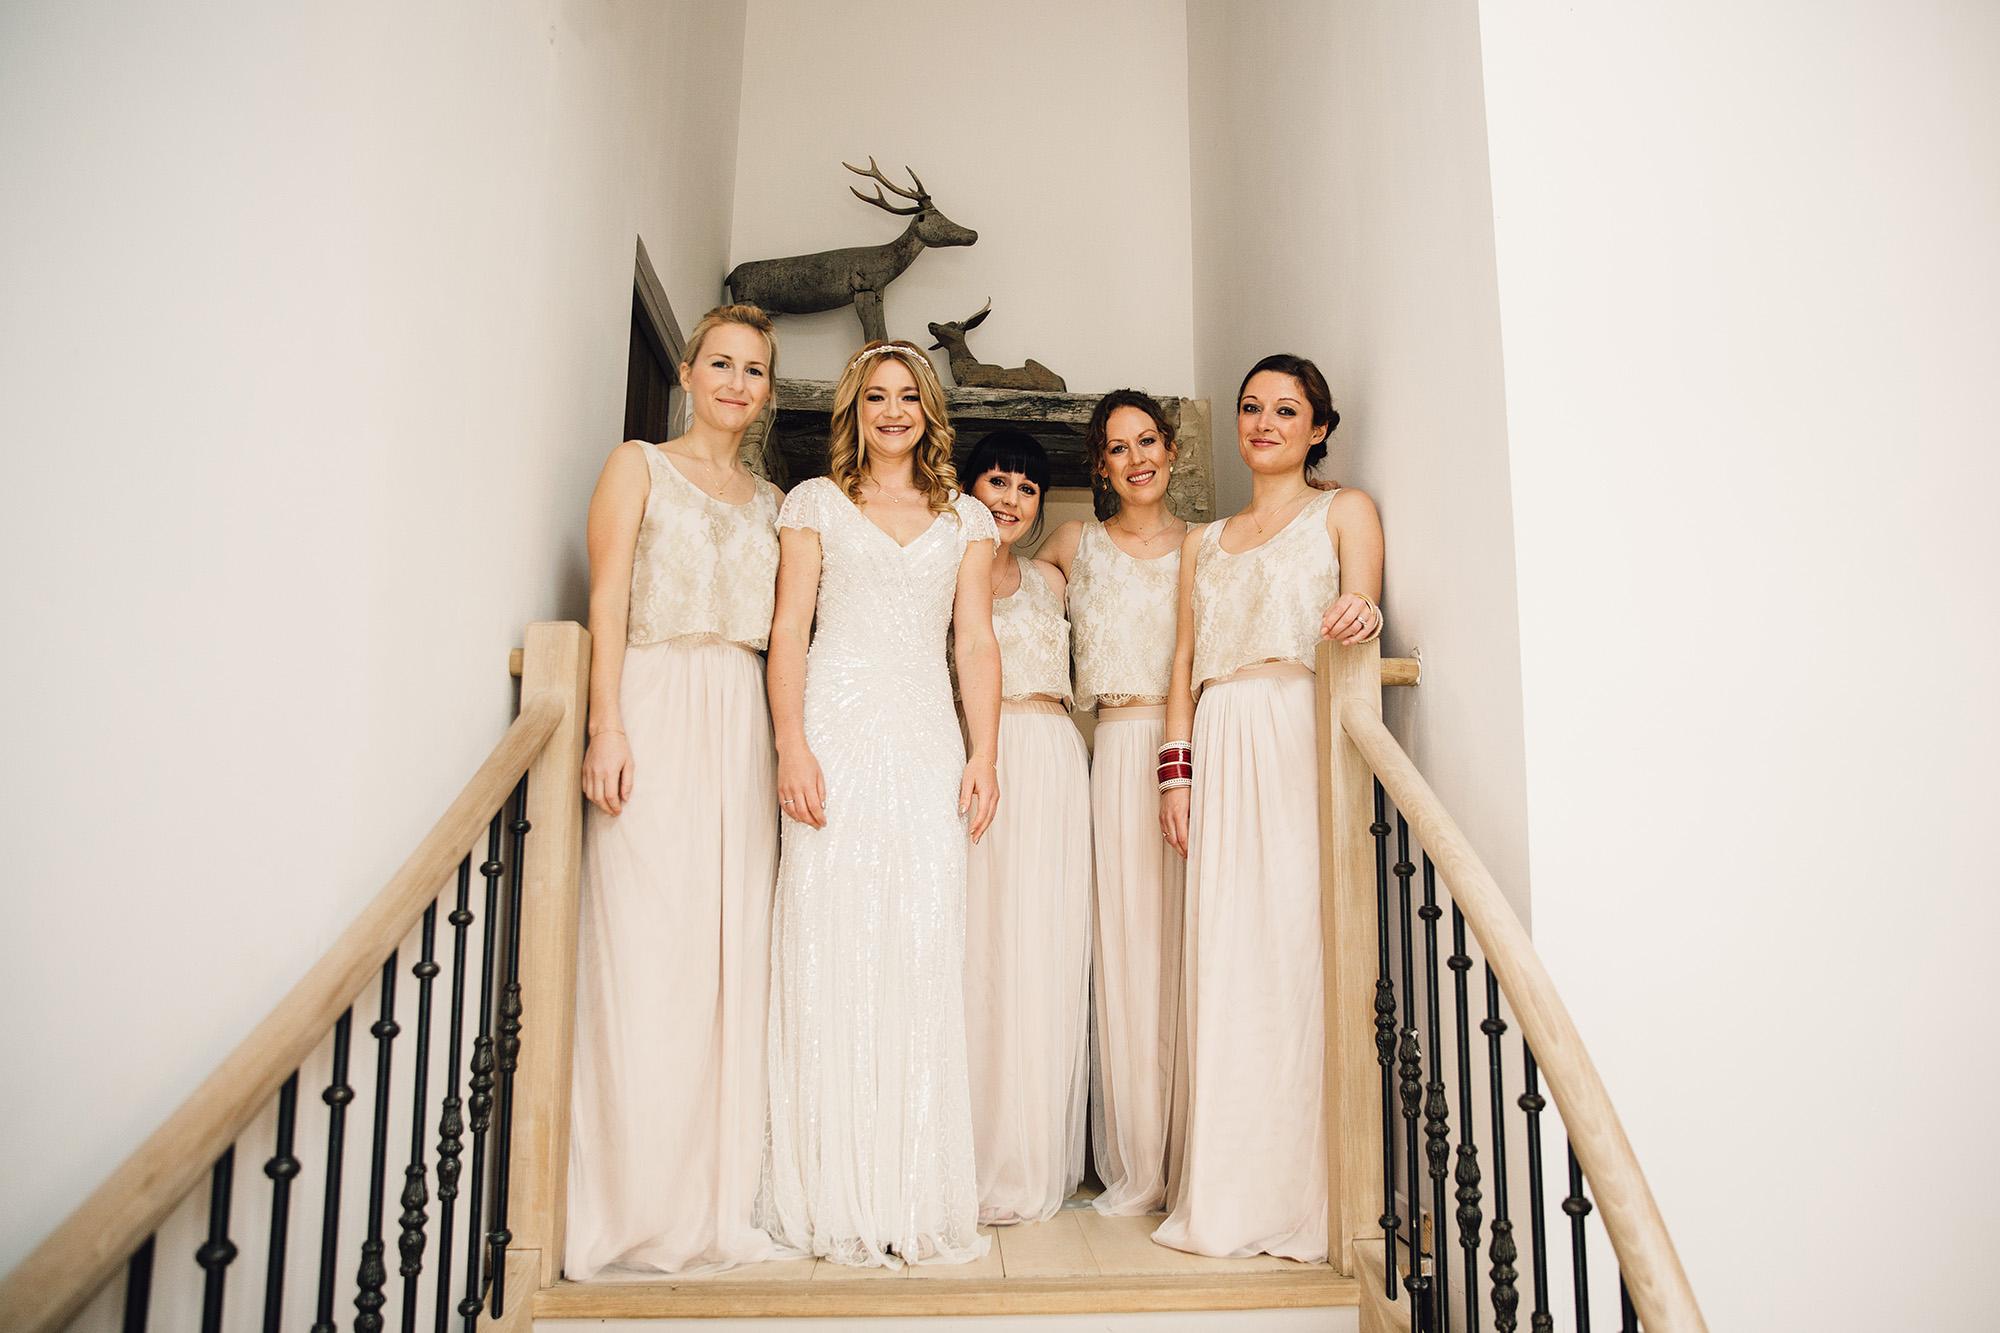 Hannah-Bespoke-Bridesmaids-Bohemian-French-Wedding-Gold-Lace-Susanna-Greening-Designs-Matlock-Derbyshire-1